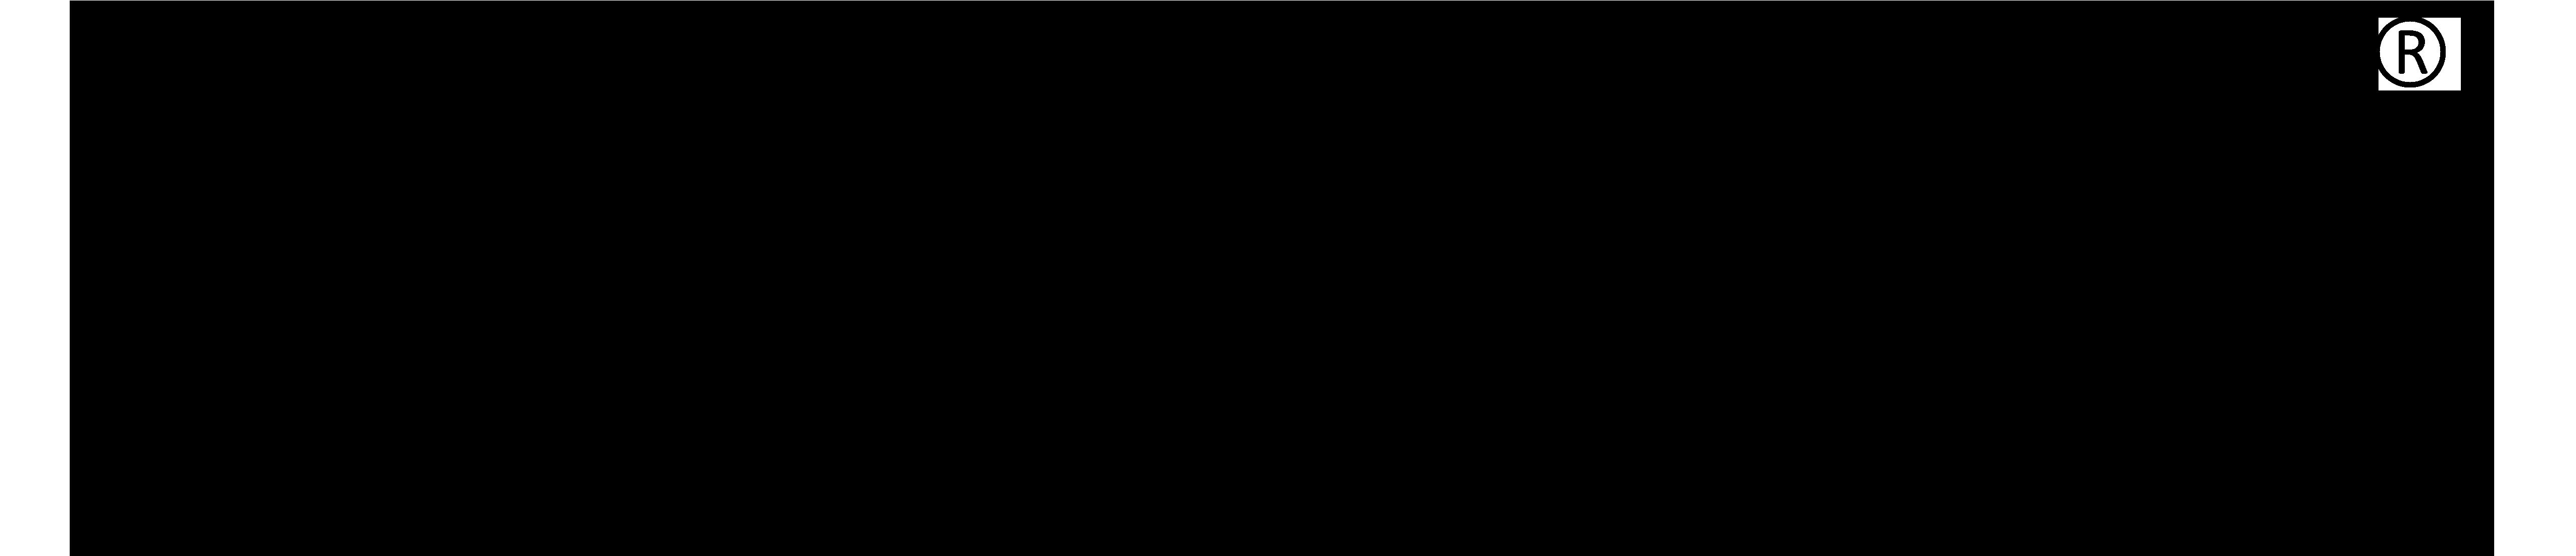 Irobot logo clipart clip art freeuse iRobot – Logos Download clip art freeuse